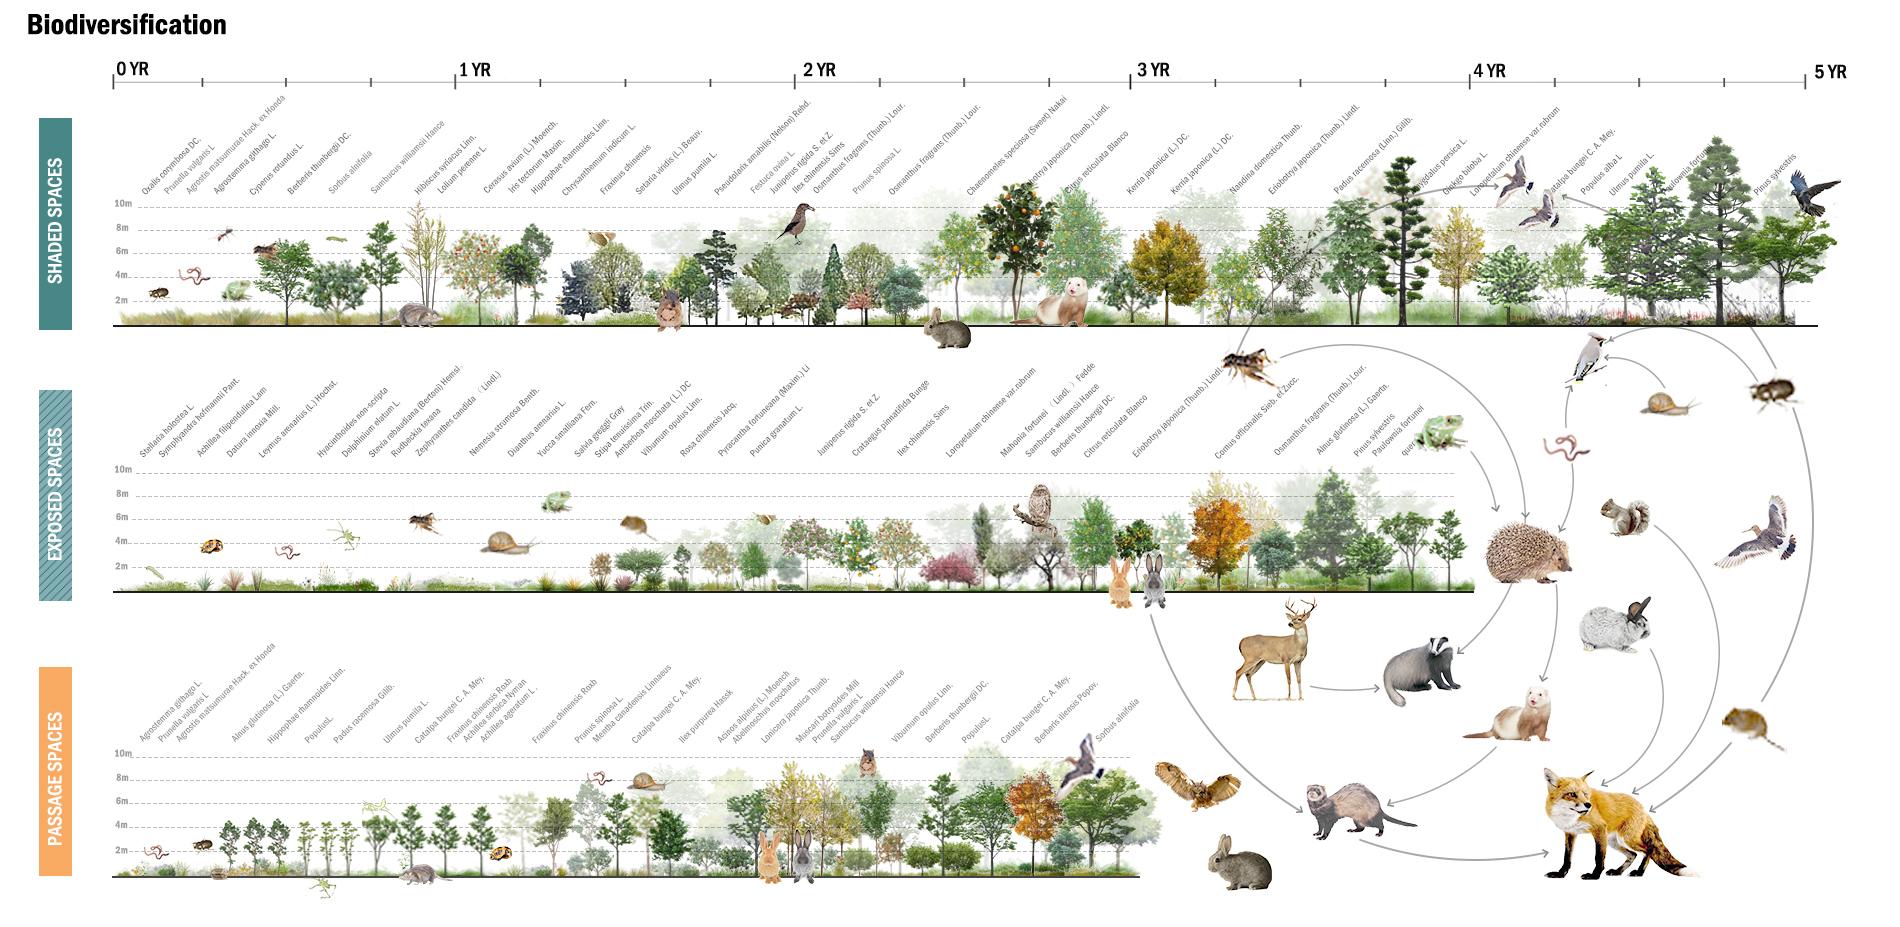 Biodiversification